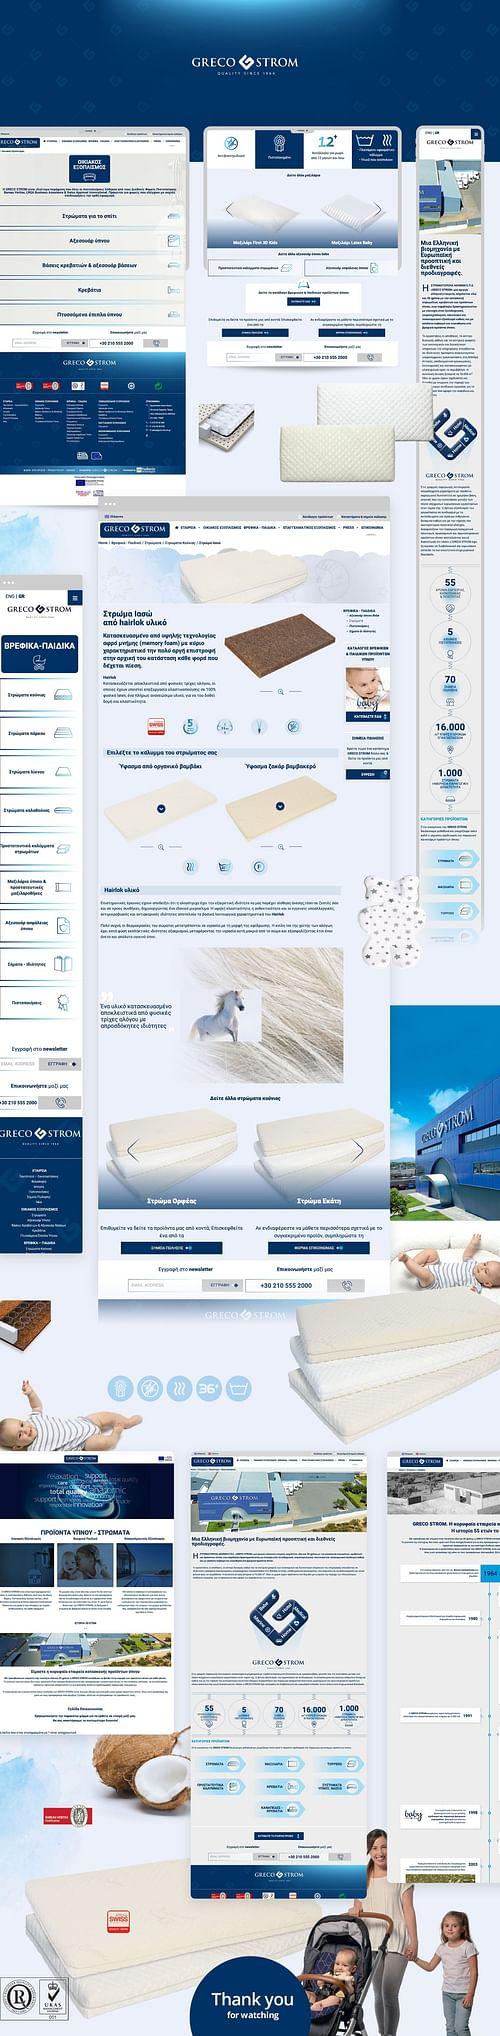 GRECO STROM Sleep mattresses - Digital Strategy